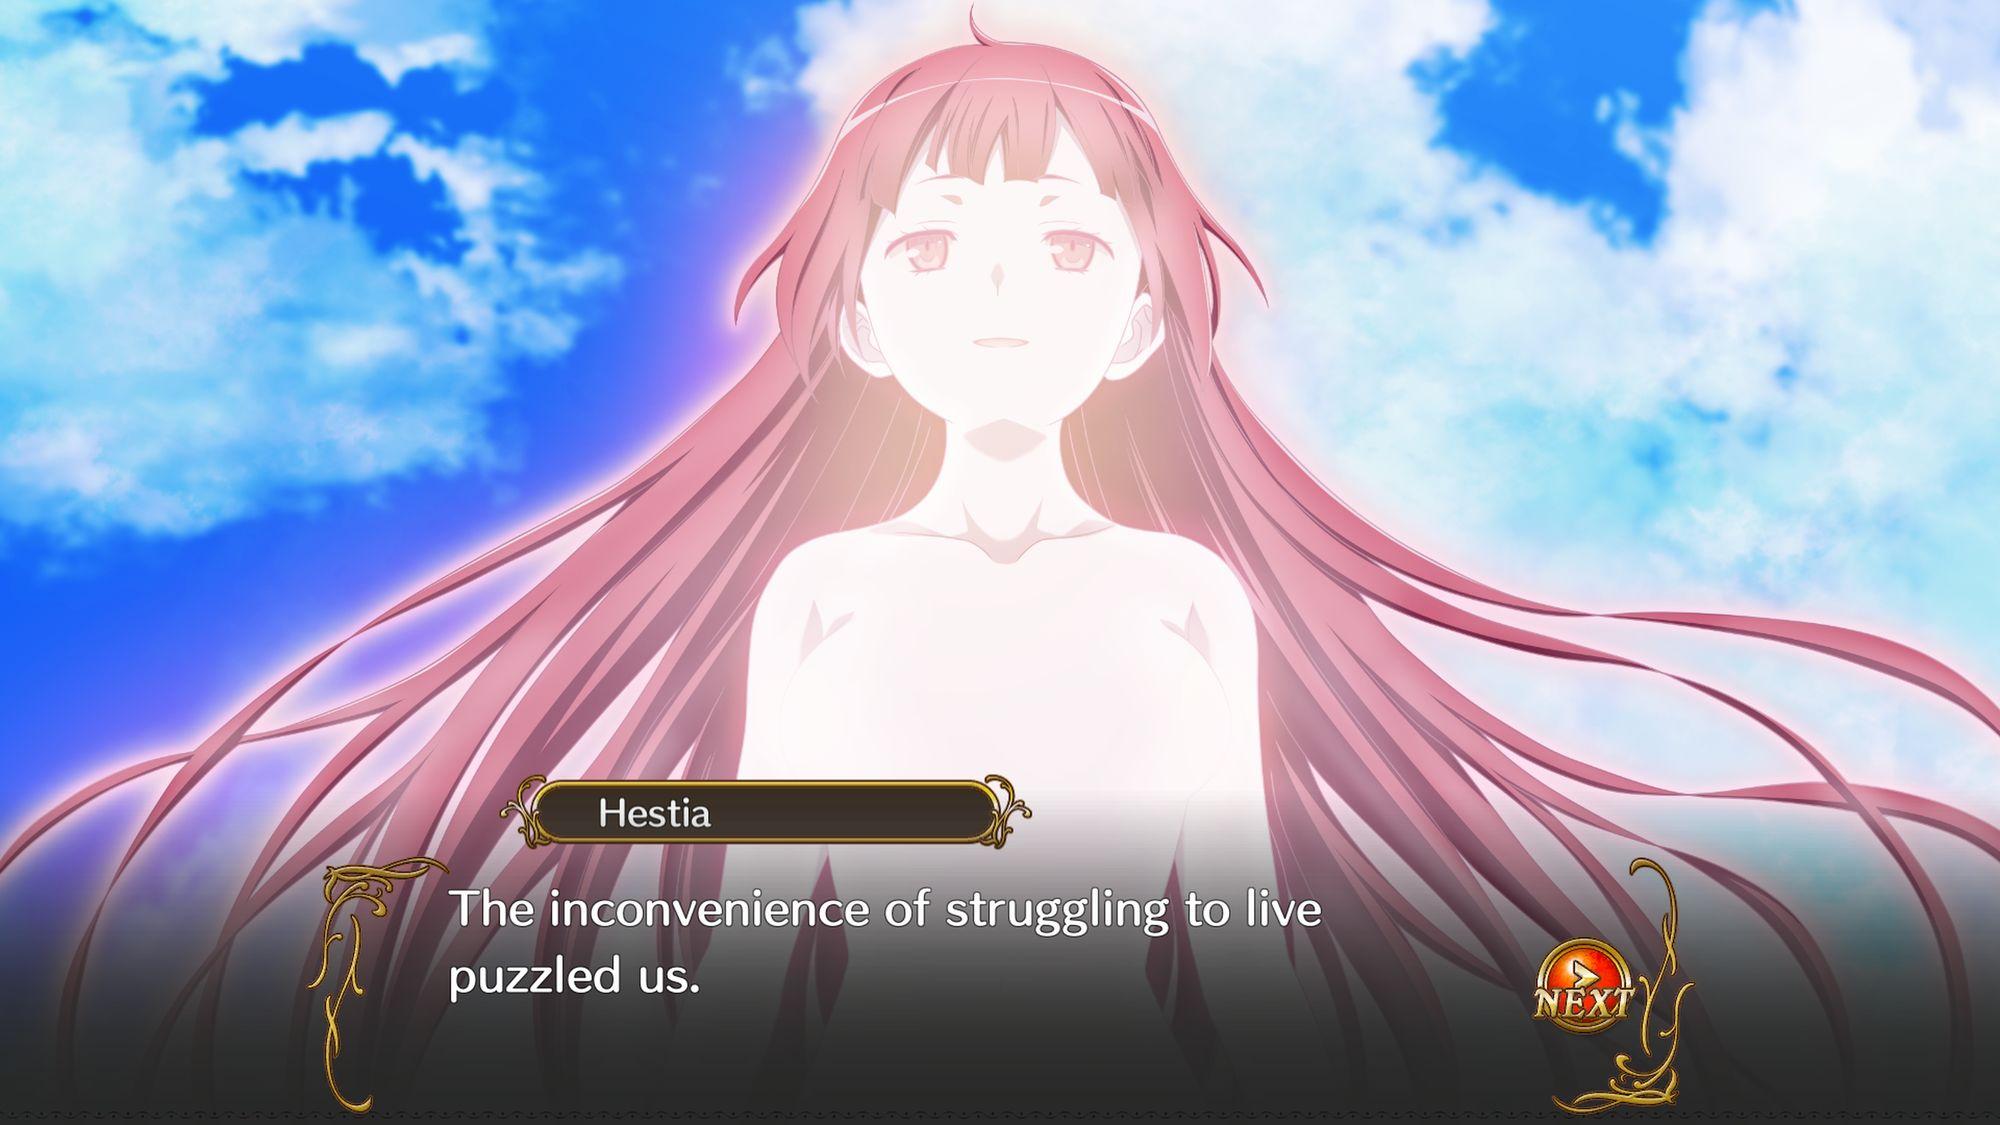 Hestia, luce divina - DanMachi: Infinite Combate - Recensione